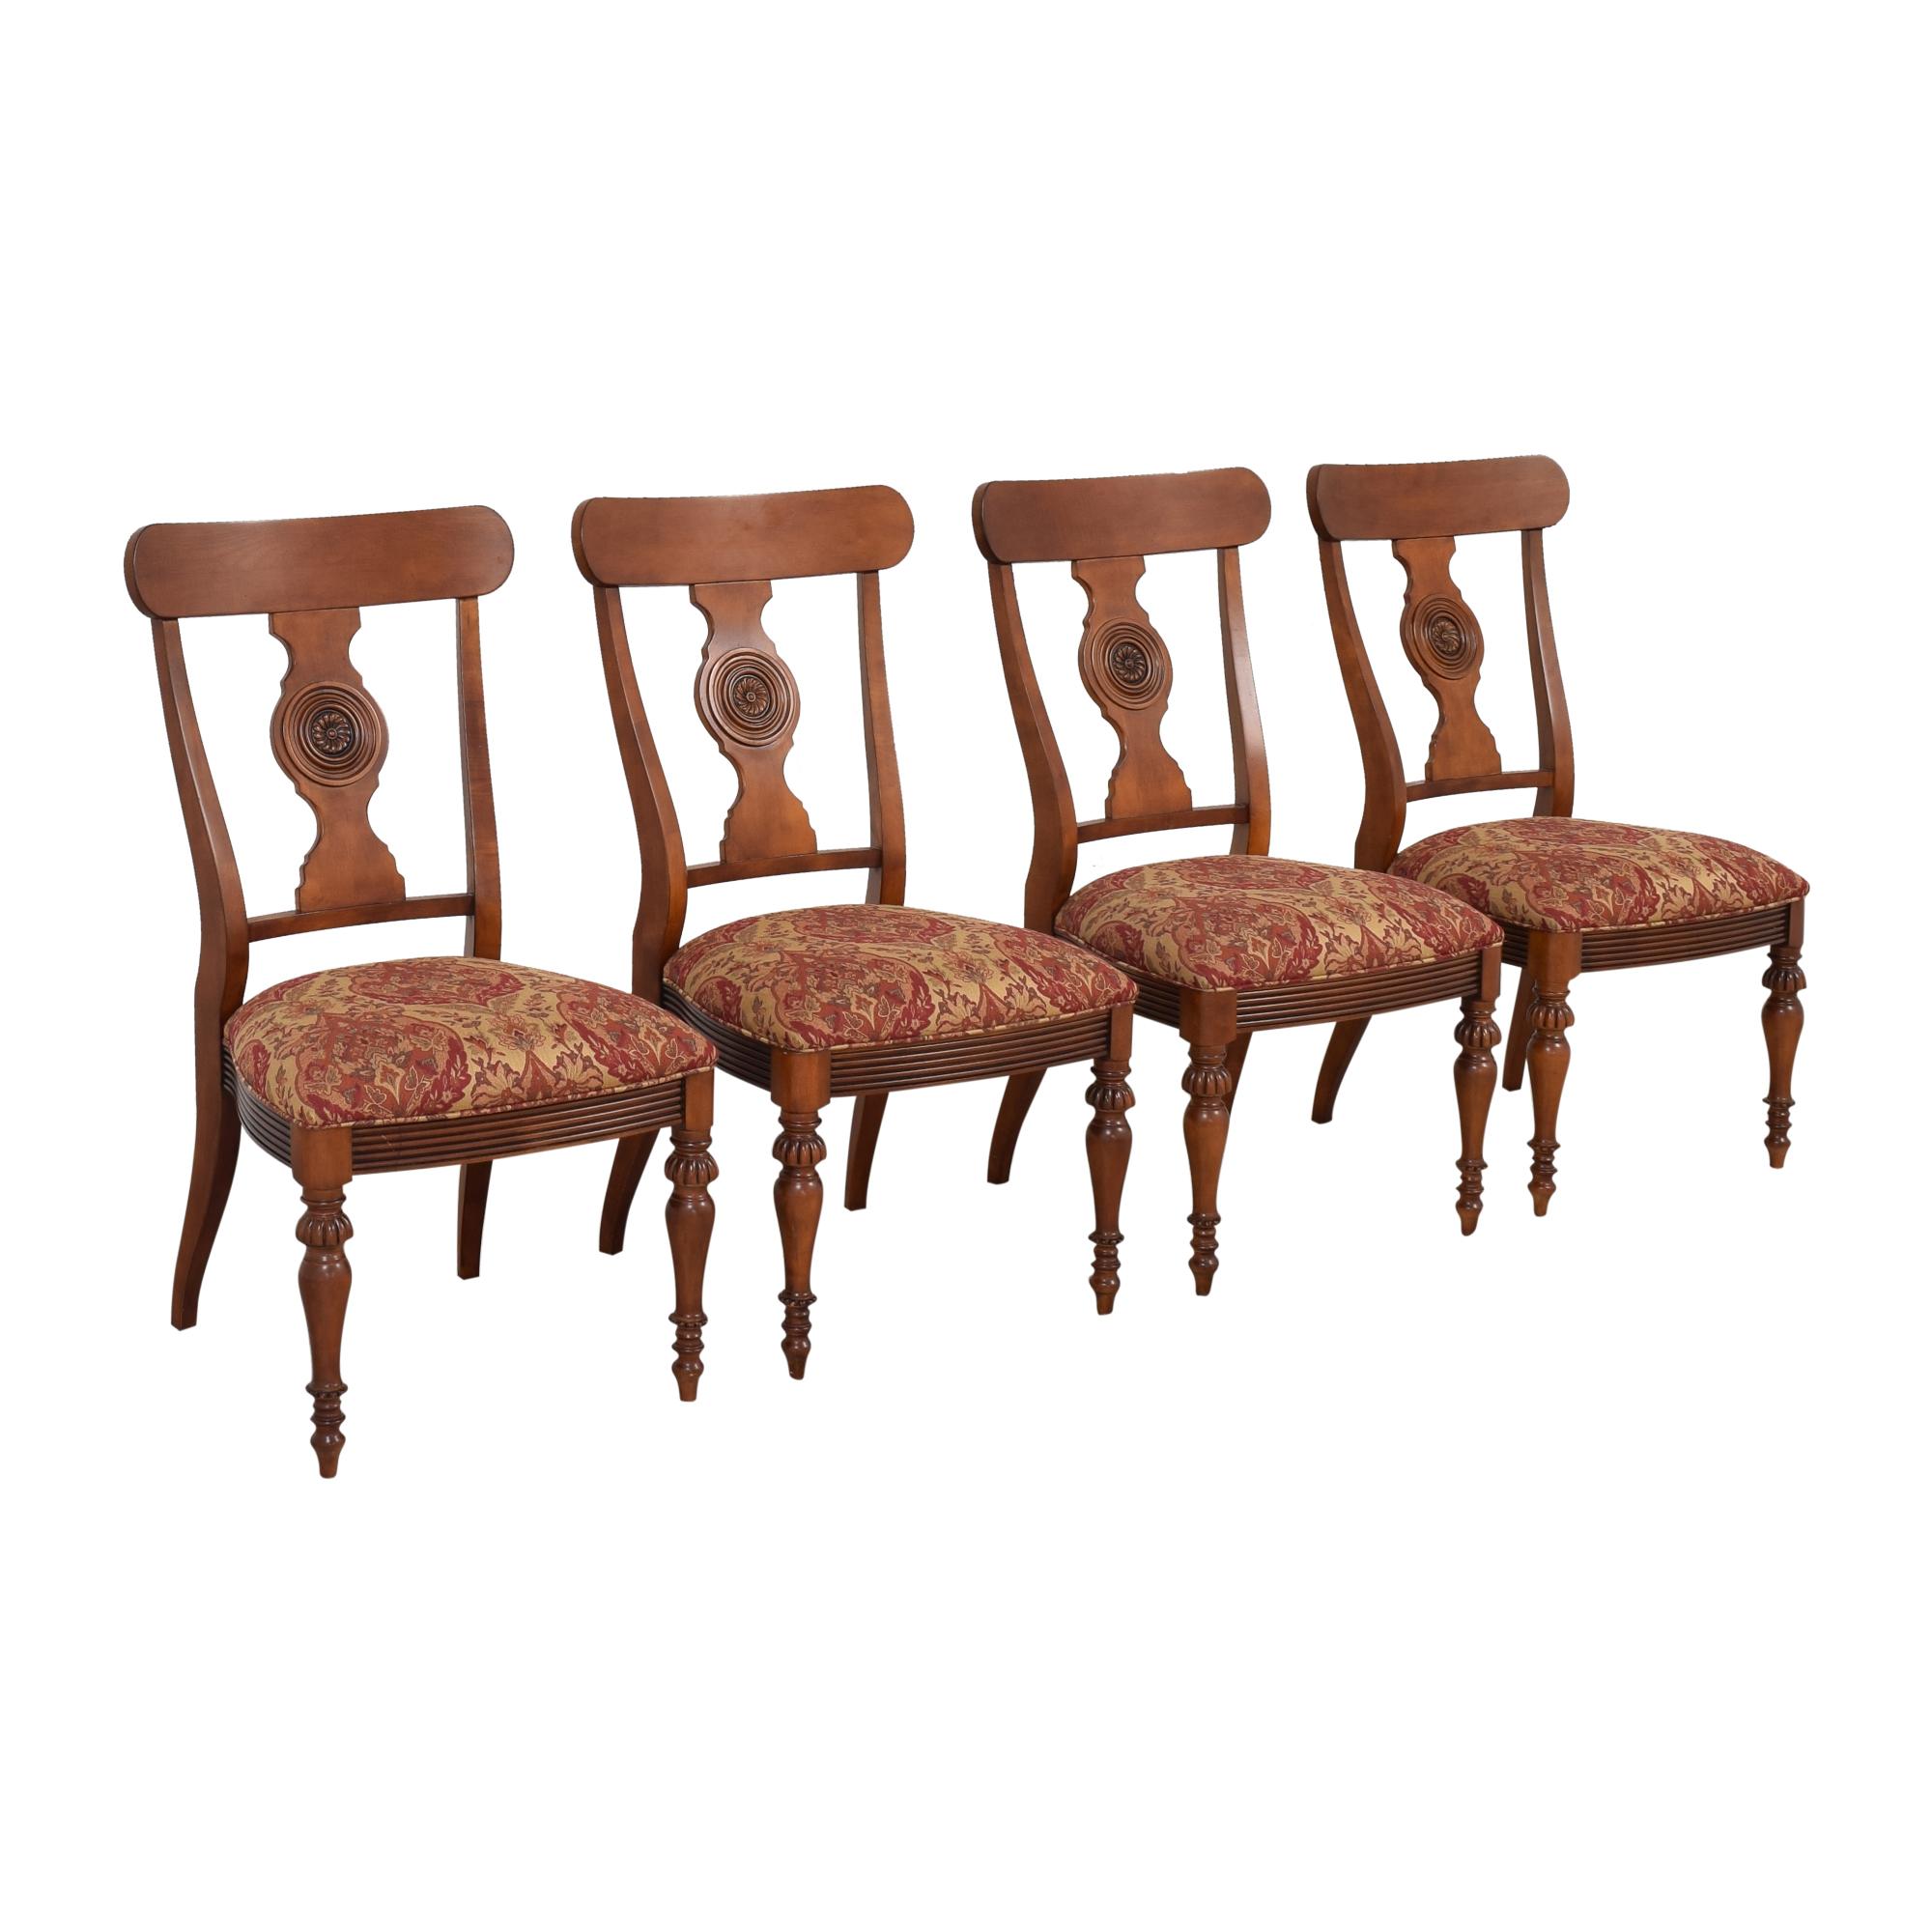 Ethan Allen Ethan Allen British Classic Splatback Dining Chairs nyc